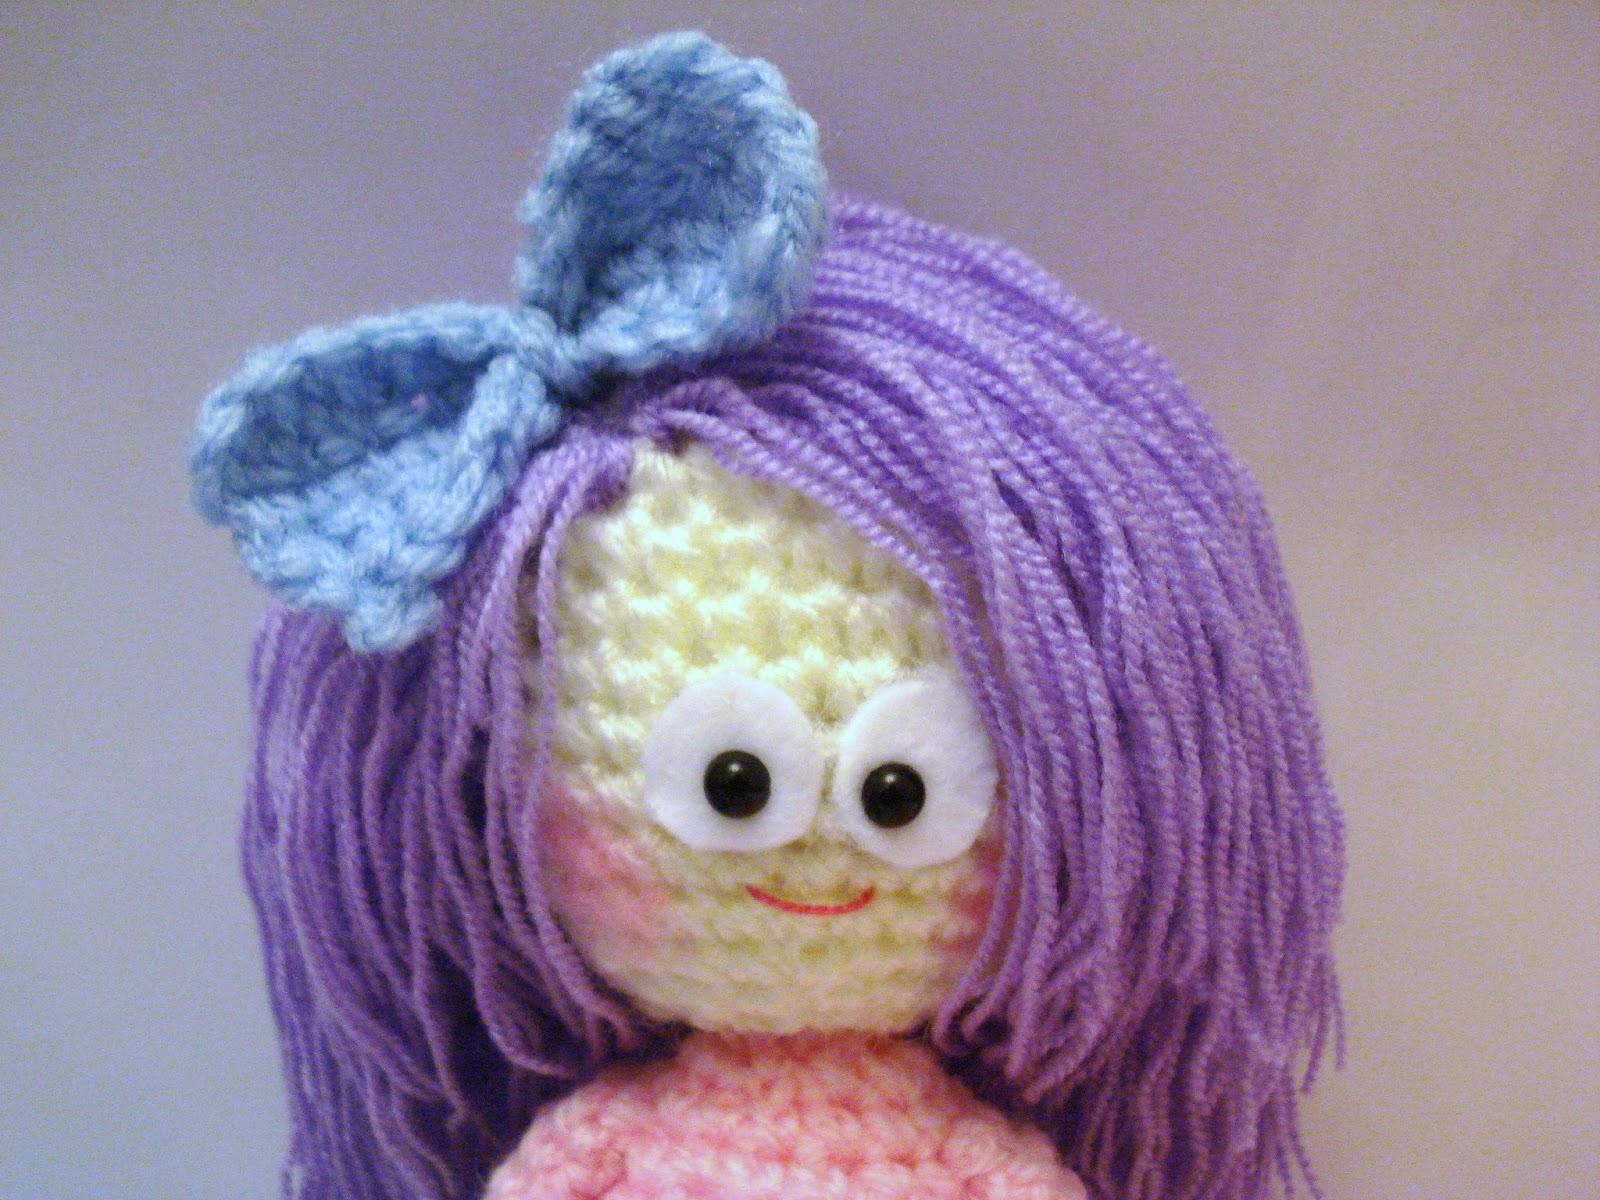 Amigurumi Pattern Girl : AllSoCute Amigurumis: Crochet Girl, Doll Pattern ...